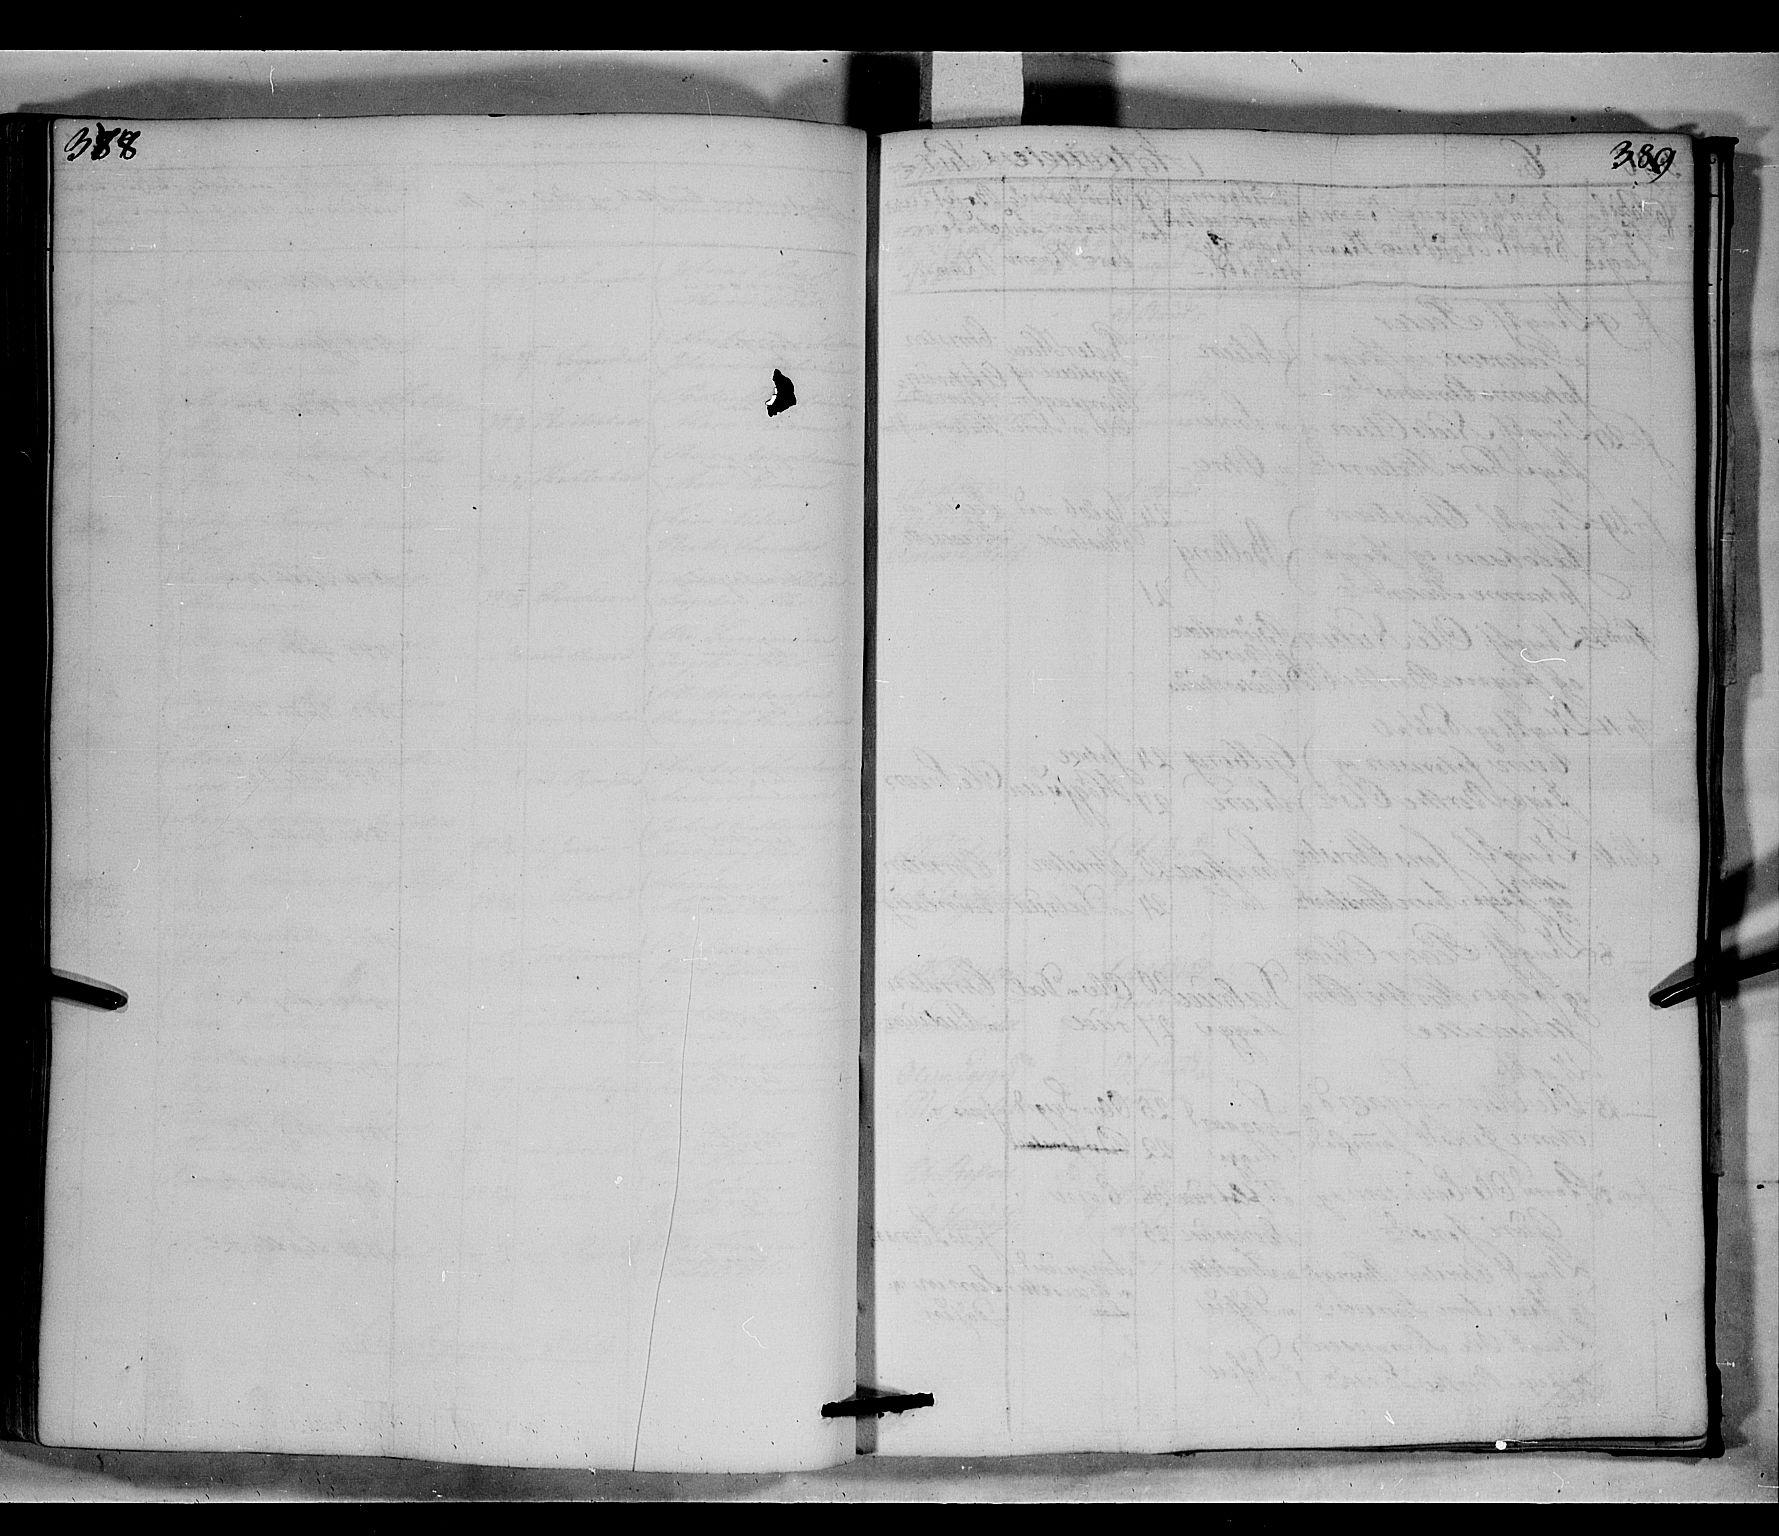 SAH, Fåberg prestekontor, Klokkerbok nr. 6, 1837-1855, s. 388-389